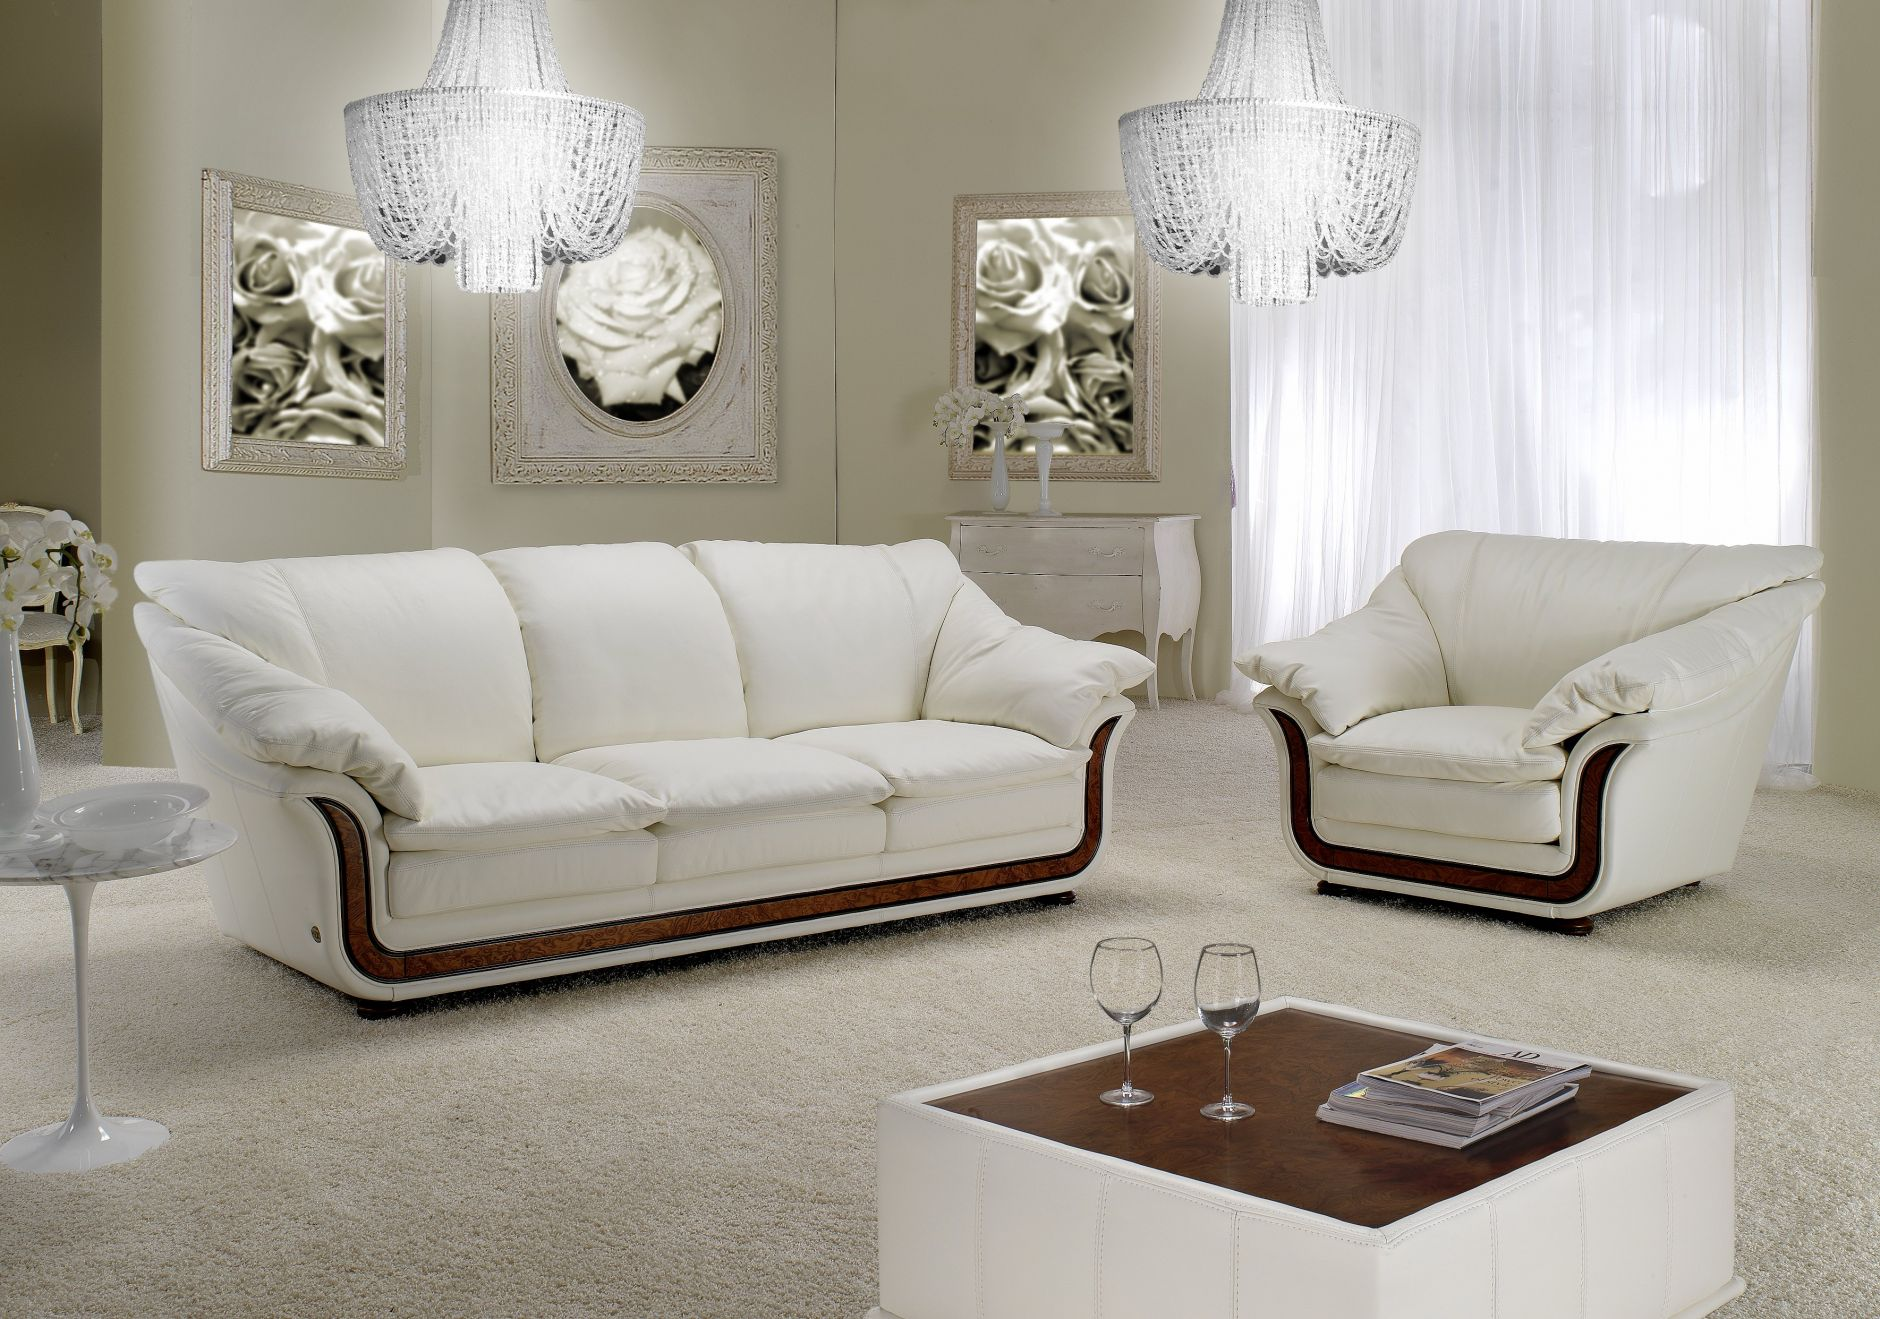 VIP-sofas - VIP-Sofas Nieri Divani CORNICHE ModellDie Möbel aus Italien